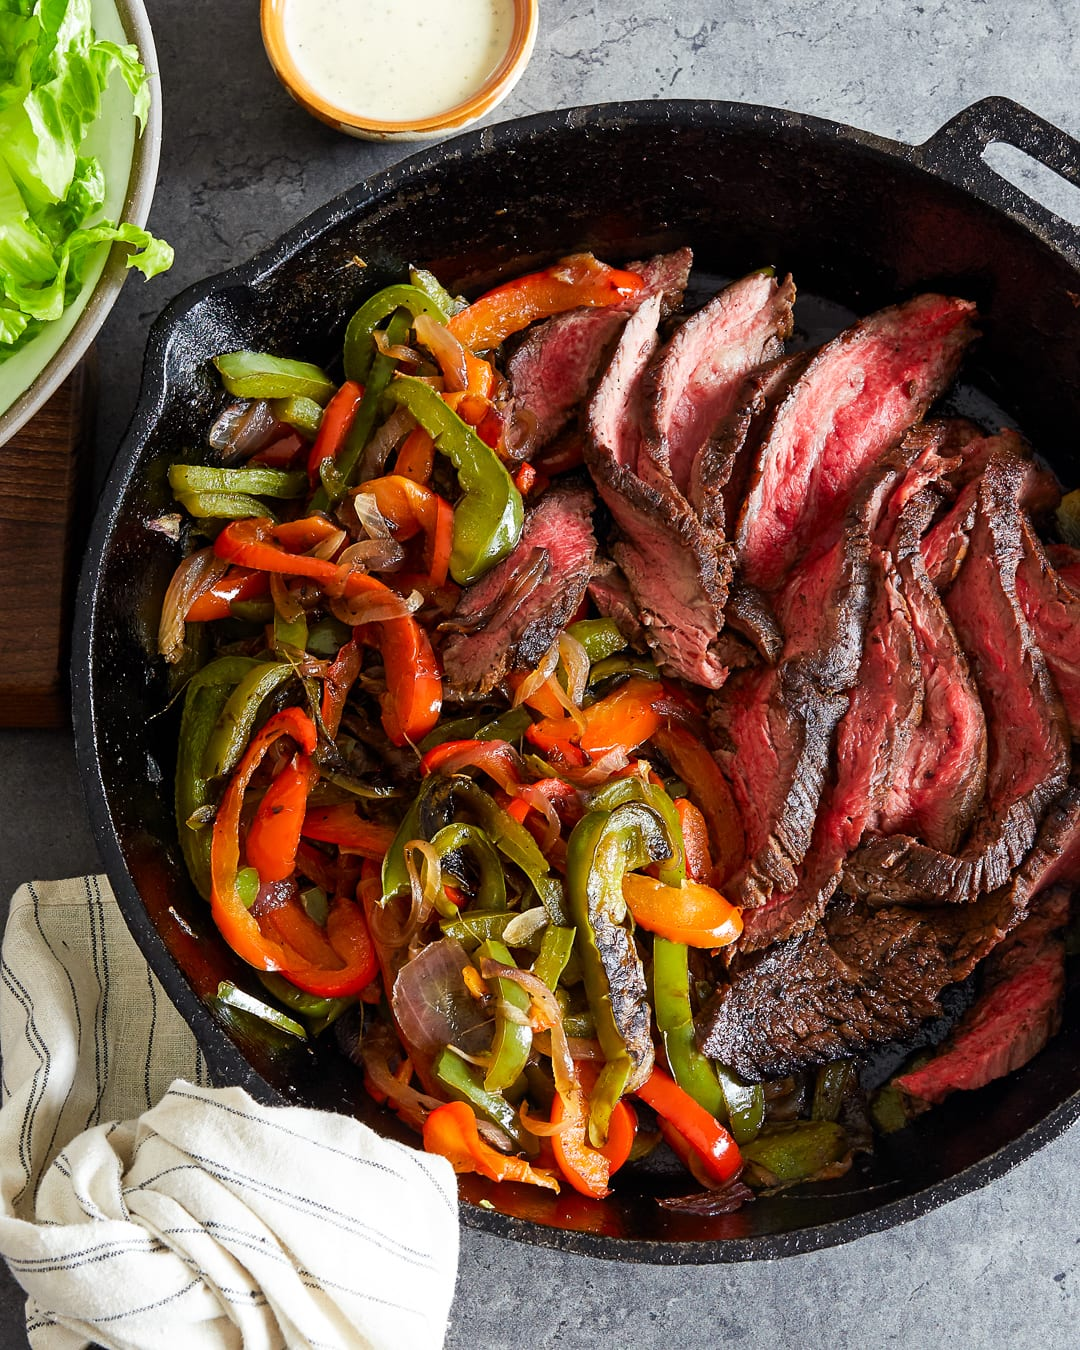 Whole30 Steak Fajitas Salad Paleo Primal Gourmet Easy Recipe Grilling Cast-Iron